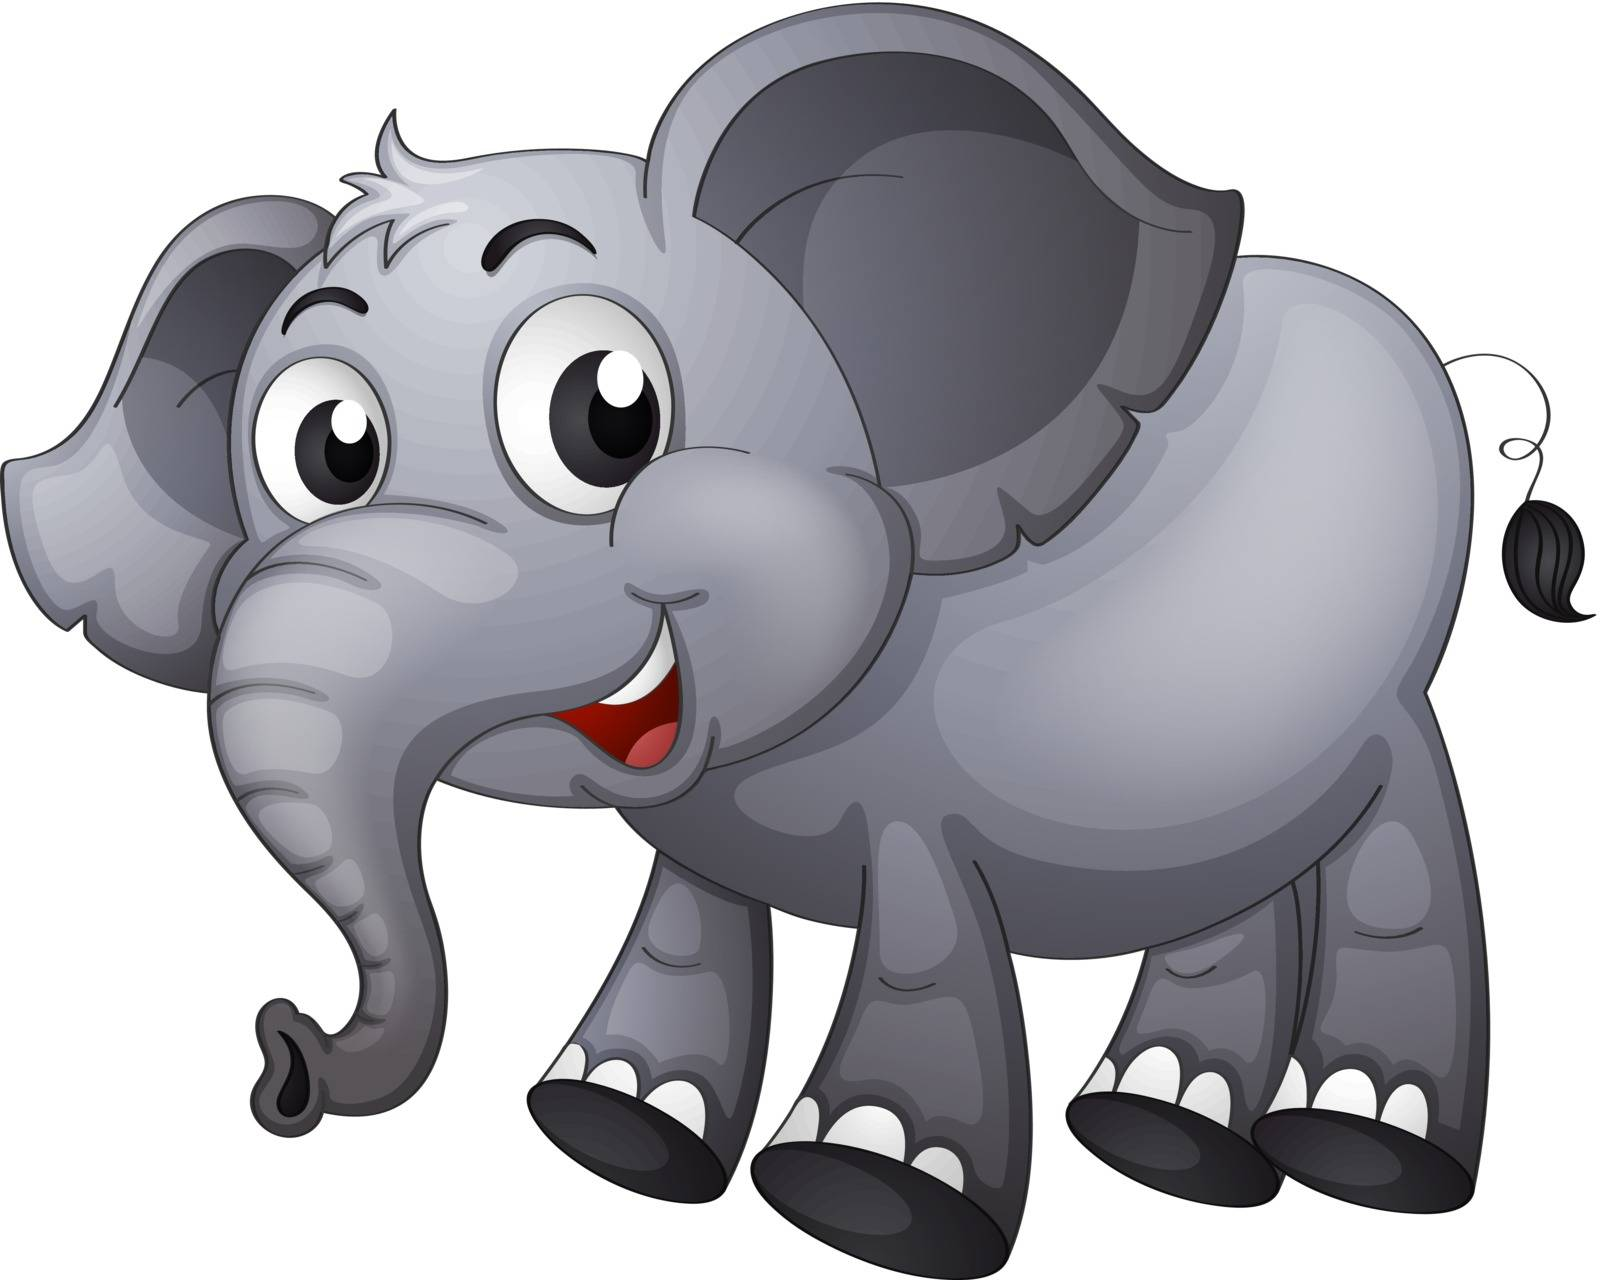 Illustration of a gray elephant